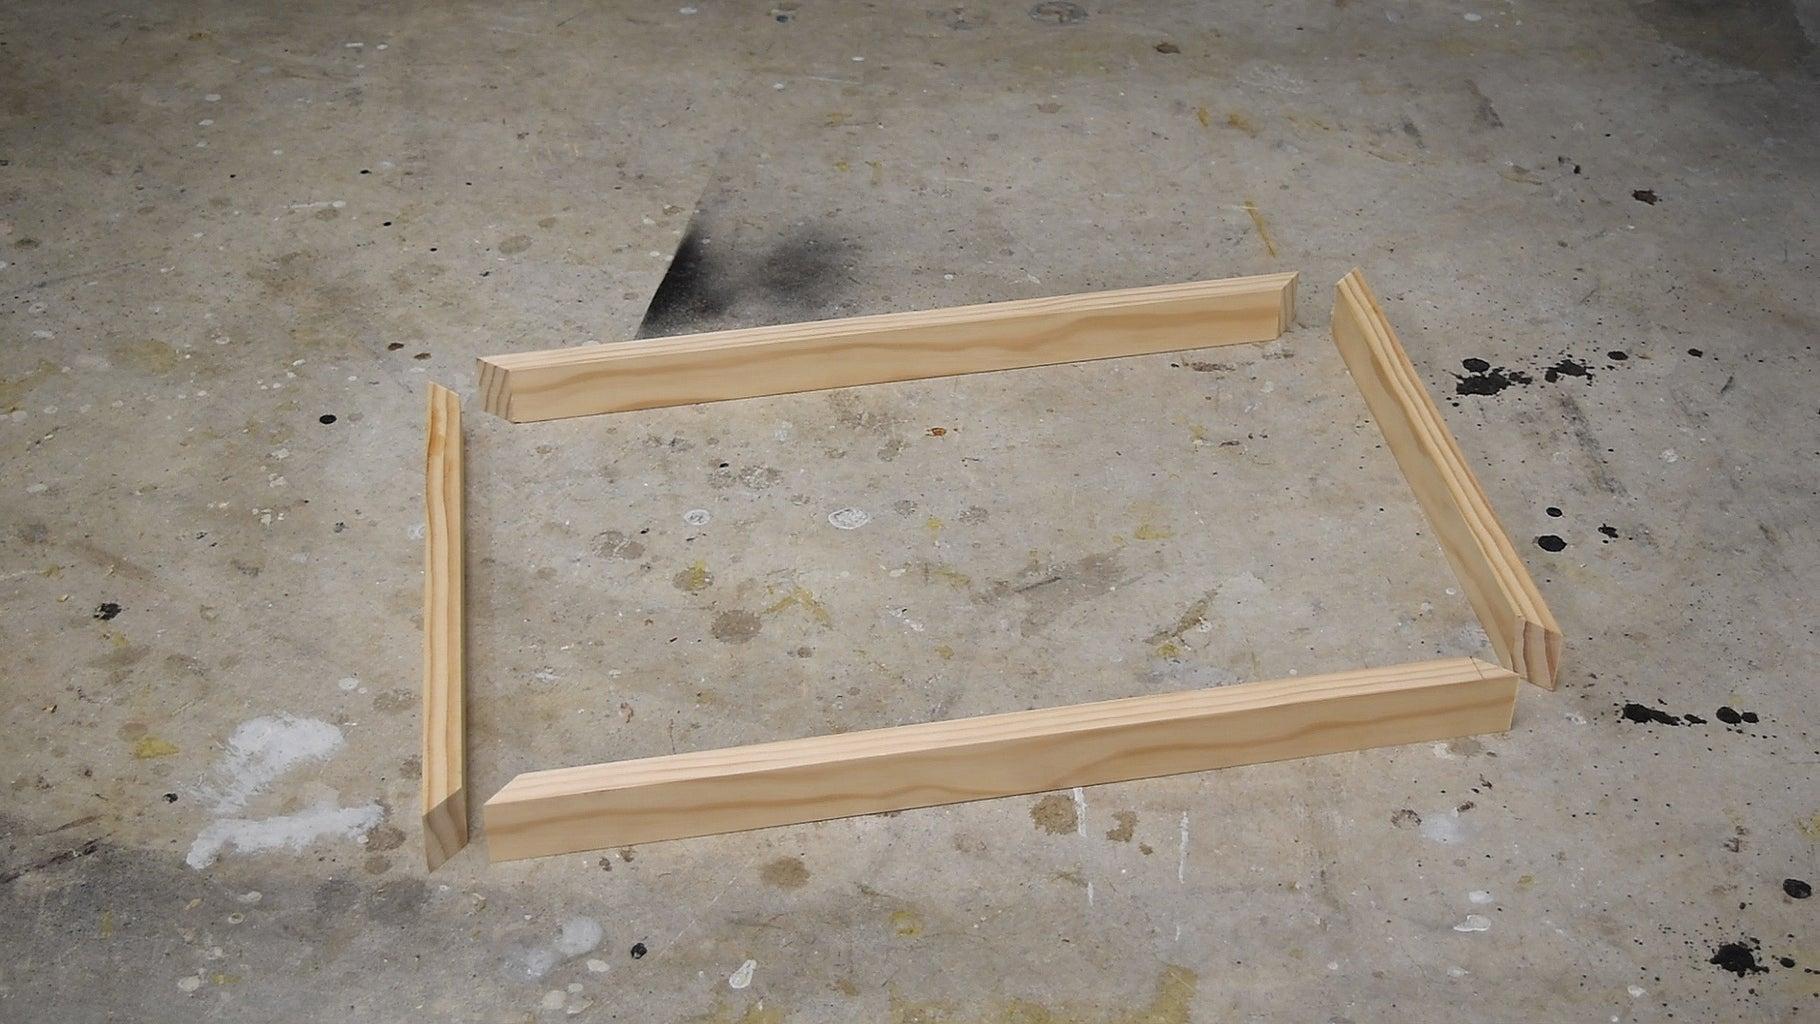 Making the Frame